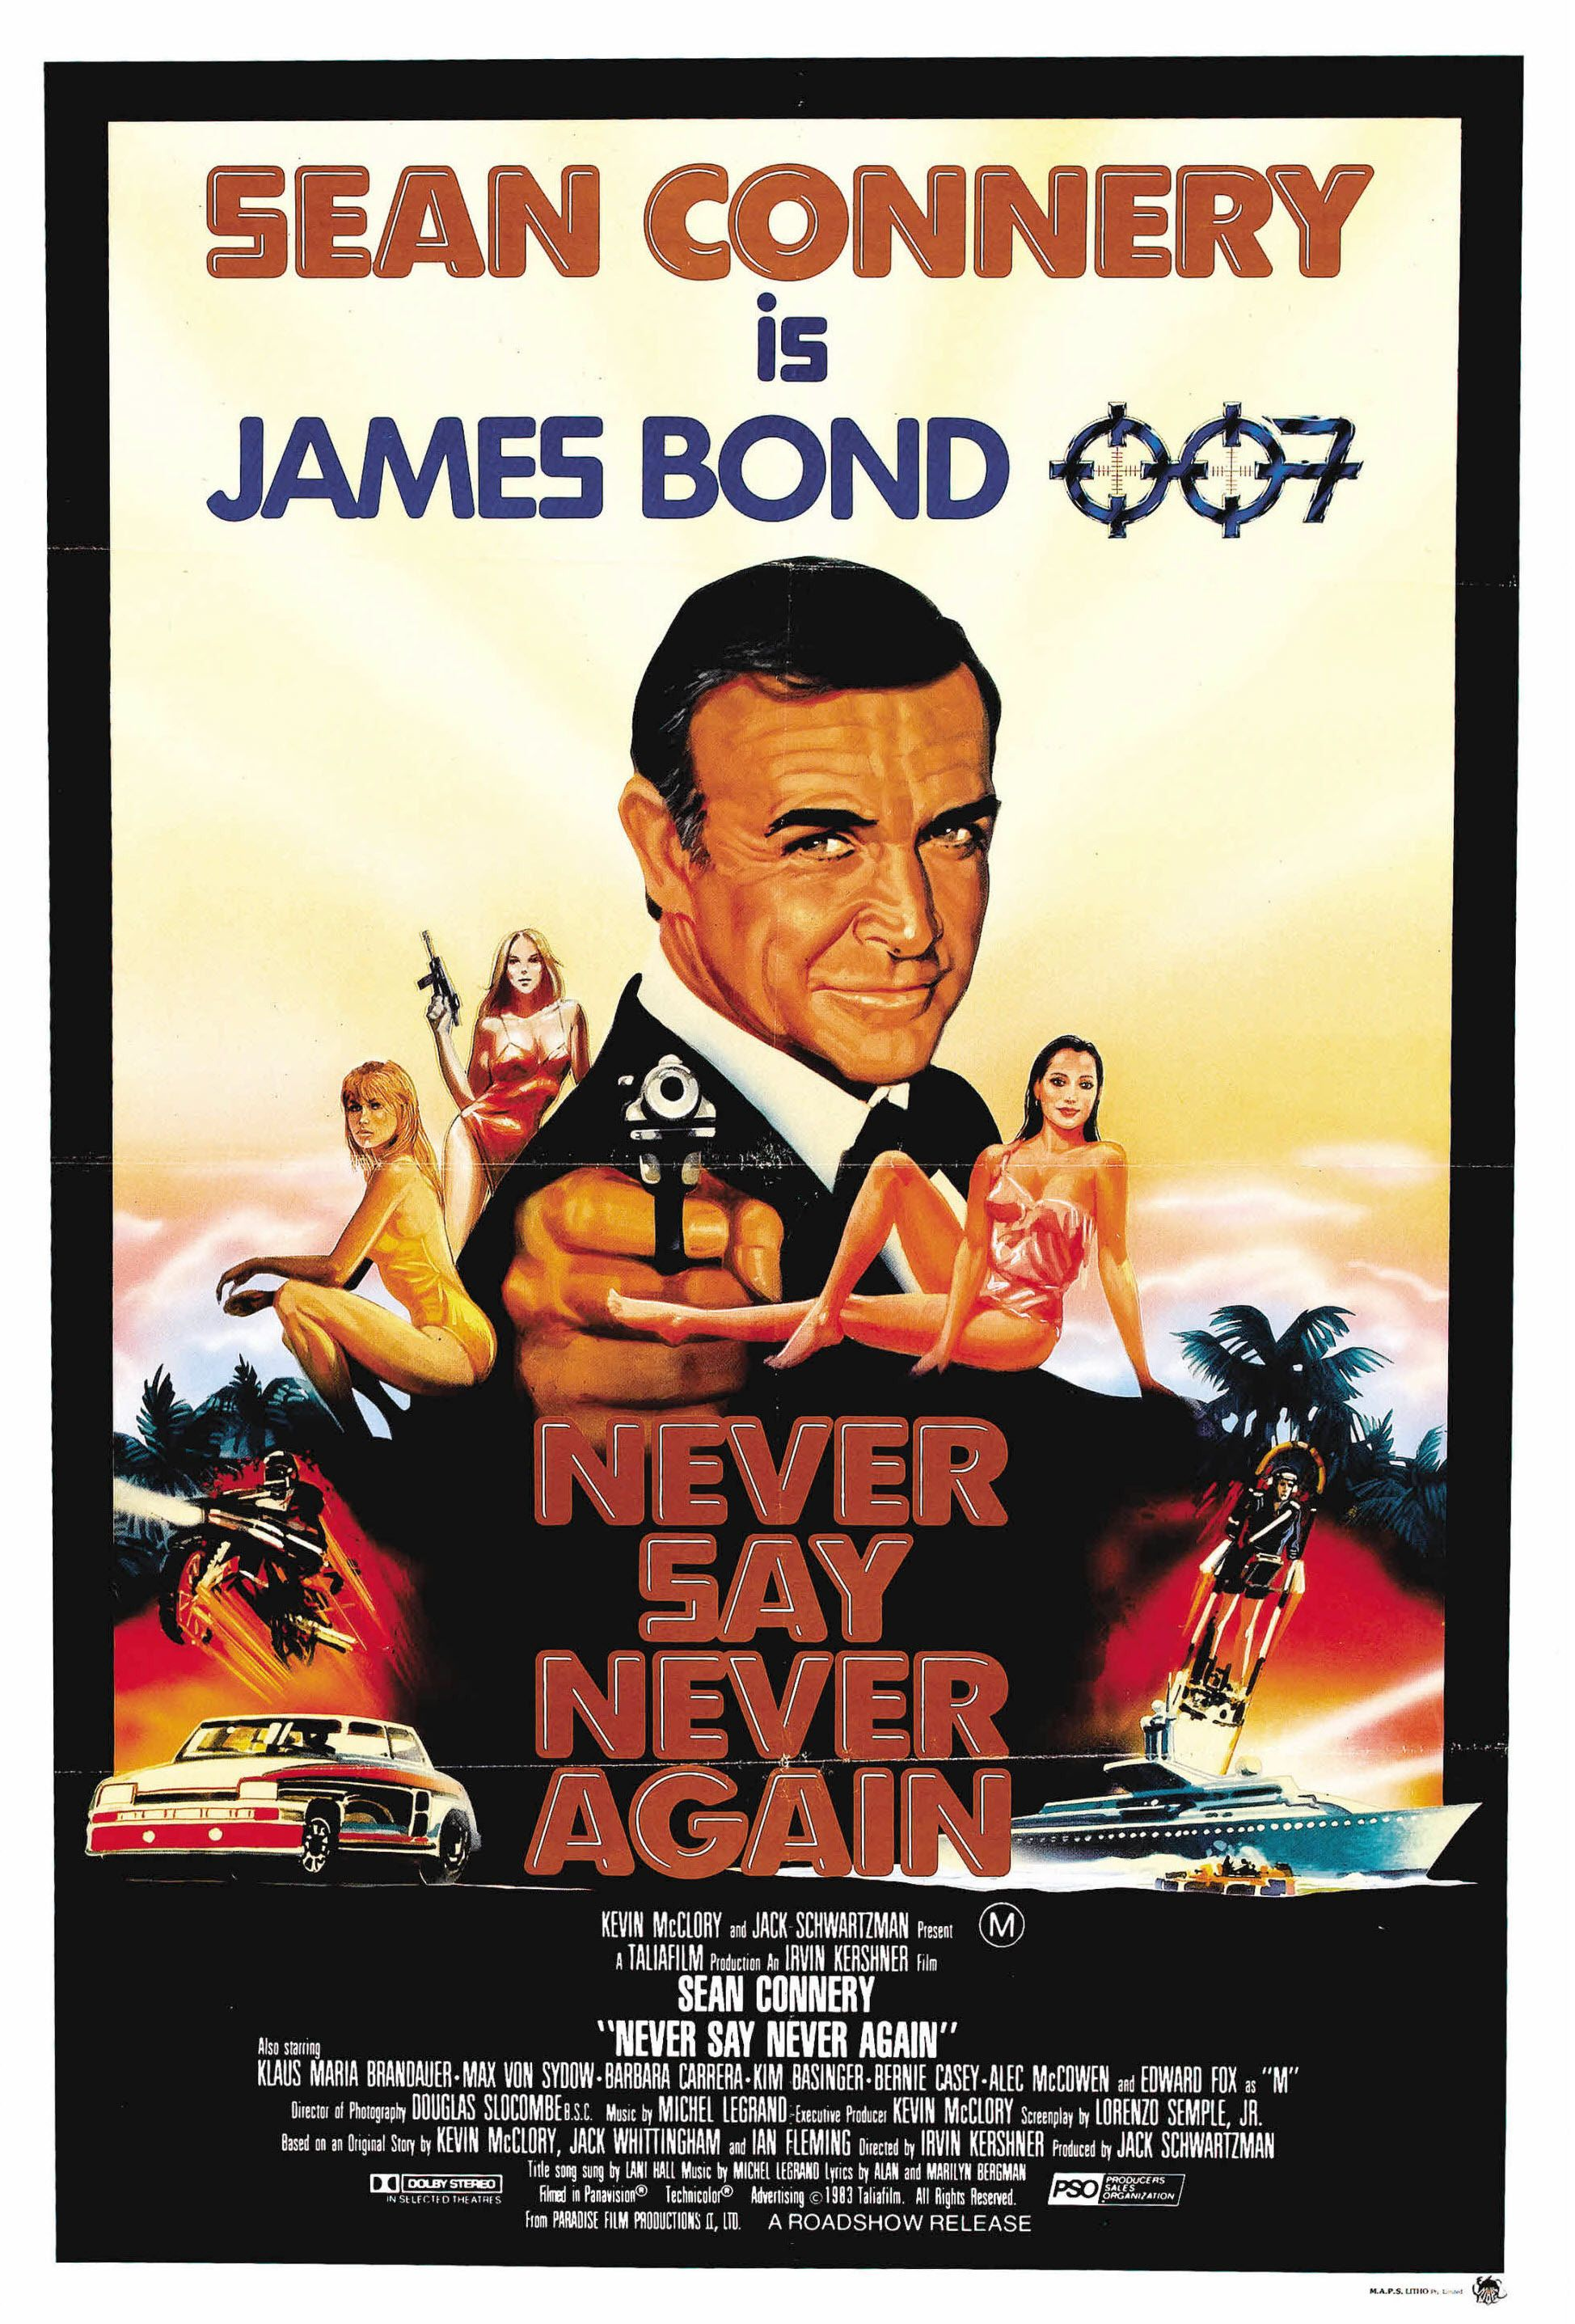 NEVER SAY NEVER AGAIN (1983) (#14) (Sean Connery as James Bond ...